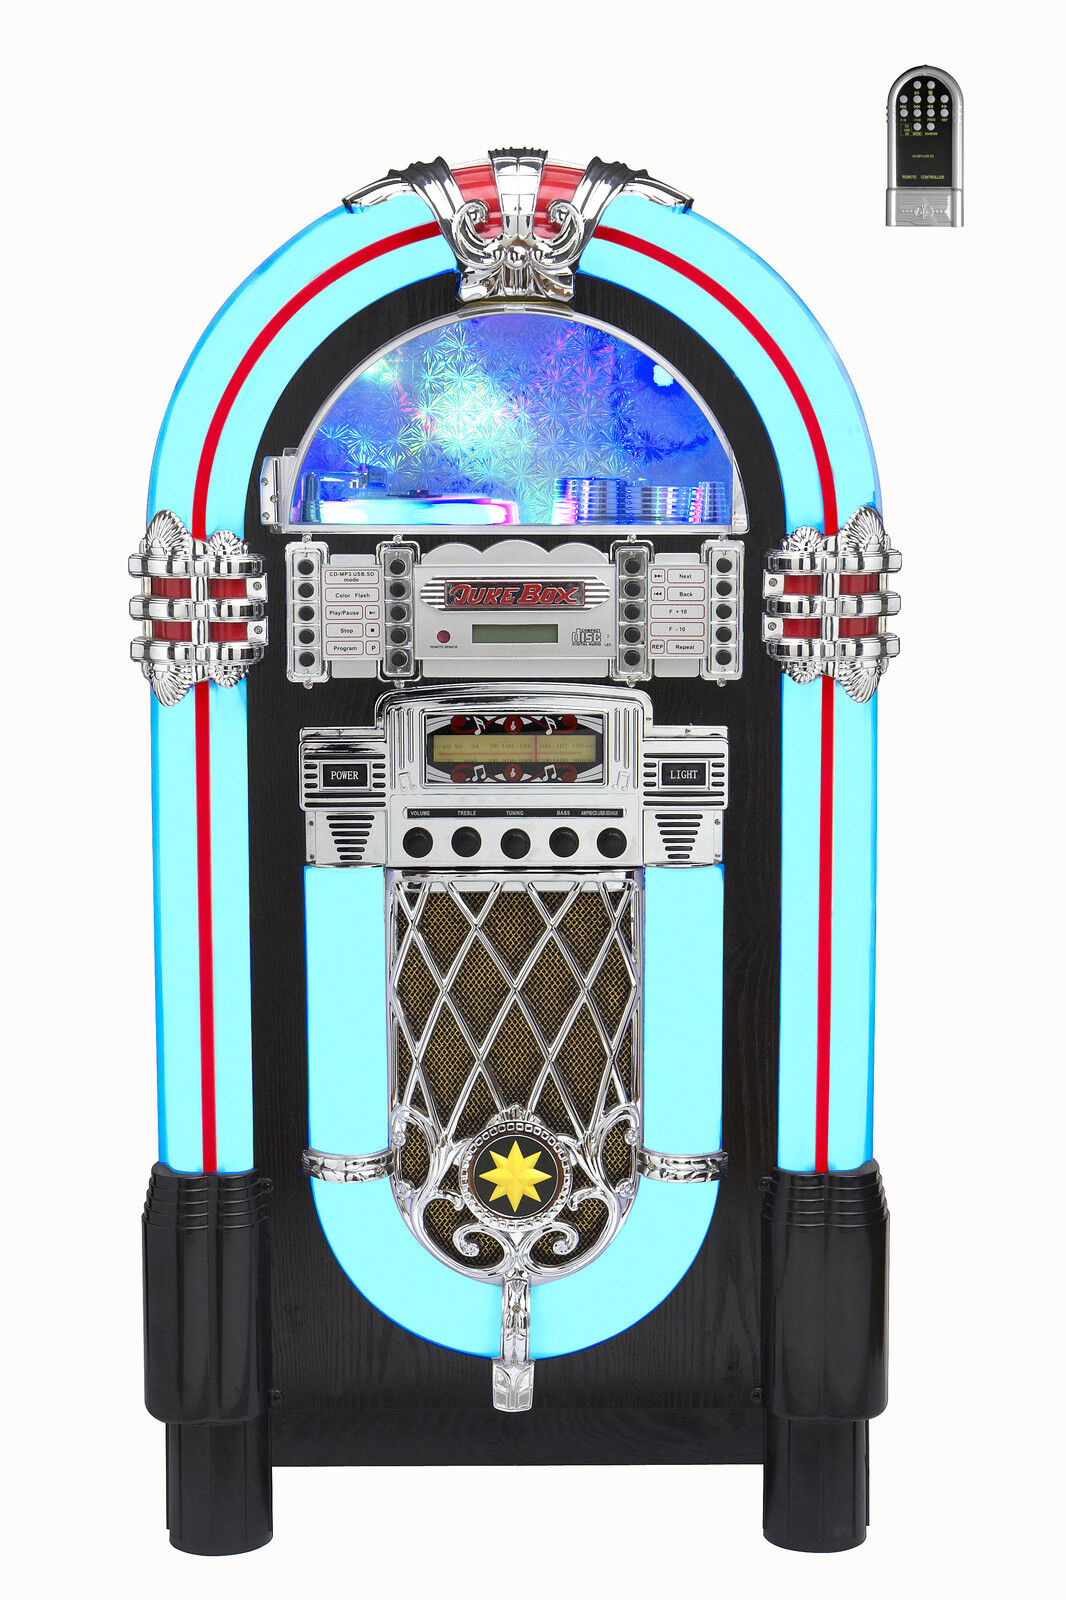 Brand Jukebox Am/fm Radio+ Cd + Usb Rrp $1499